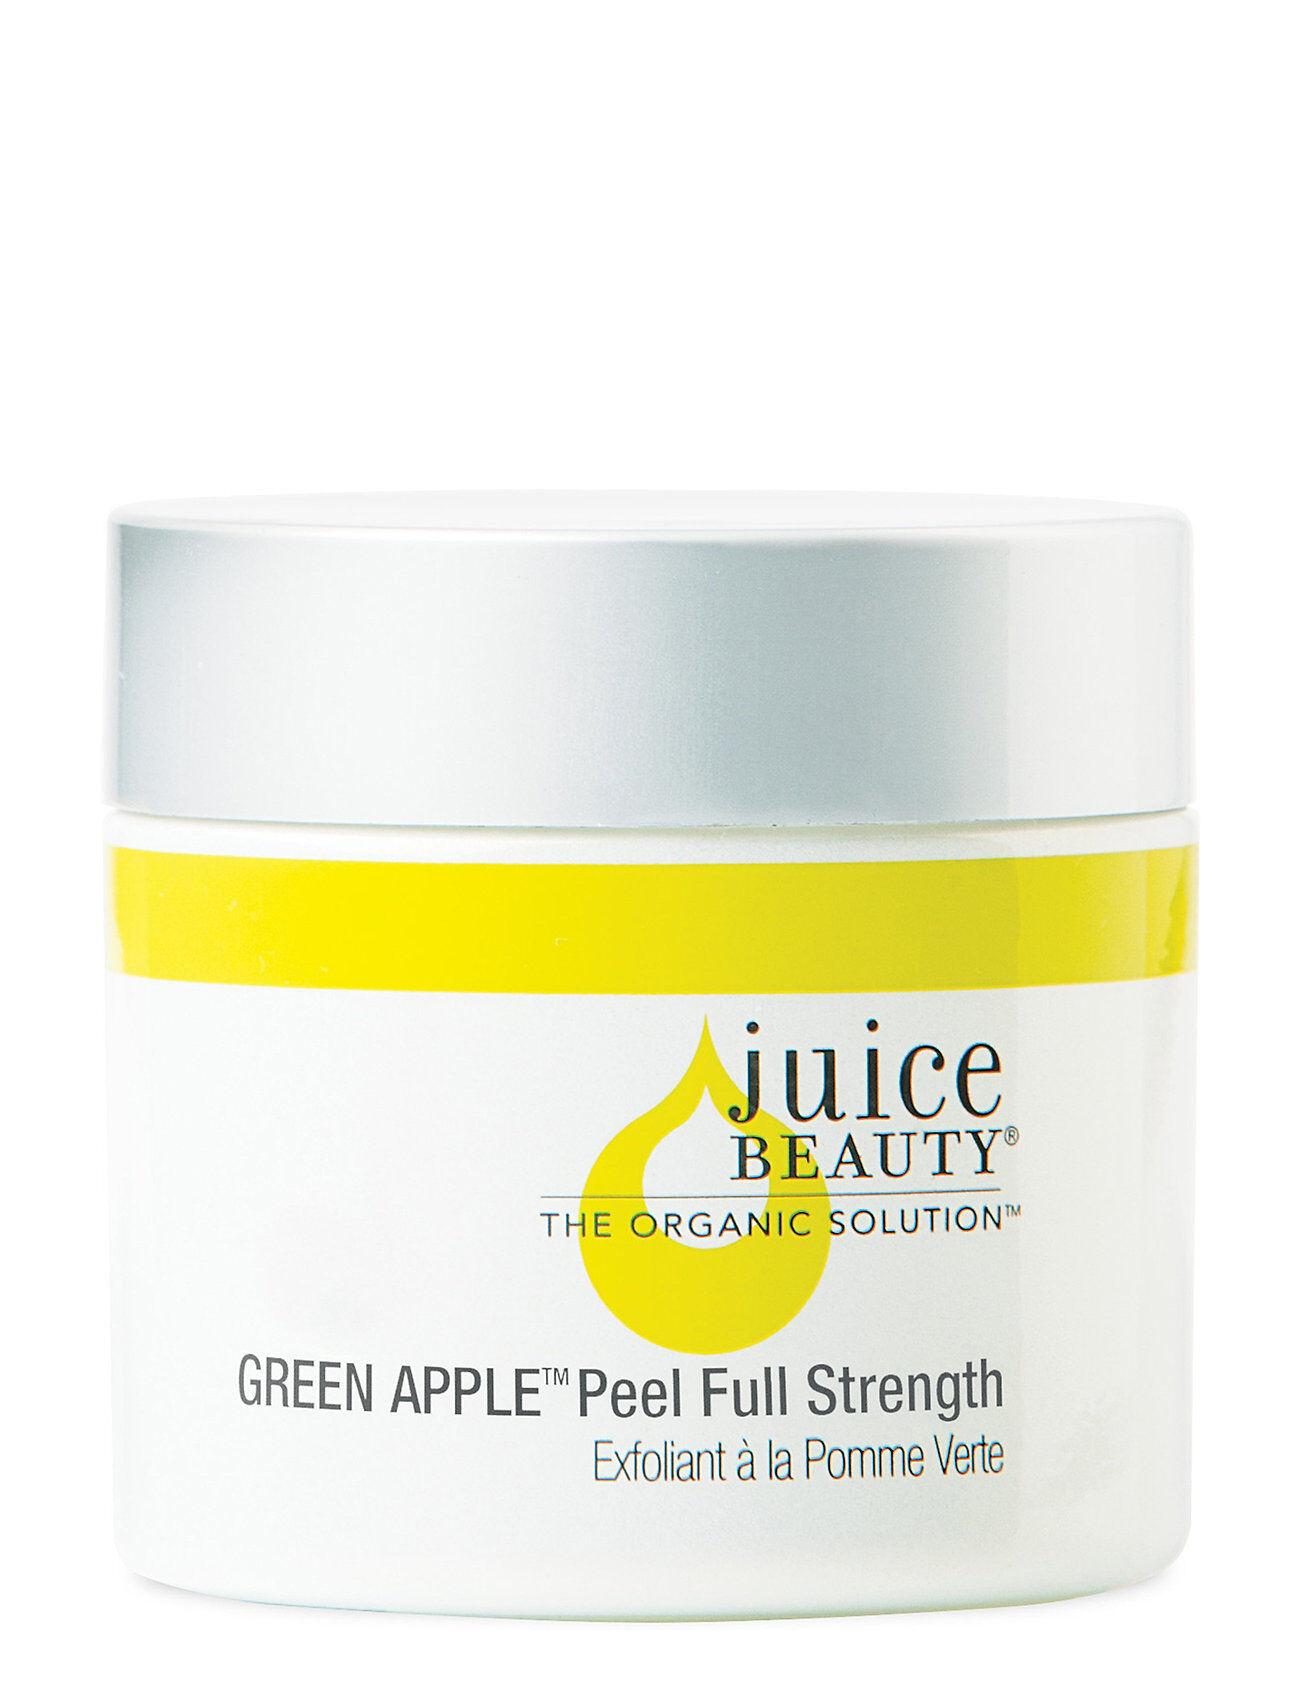 Juice Beauty Green Apple™ Peel Full Strength